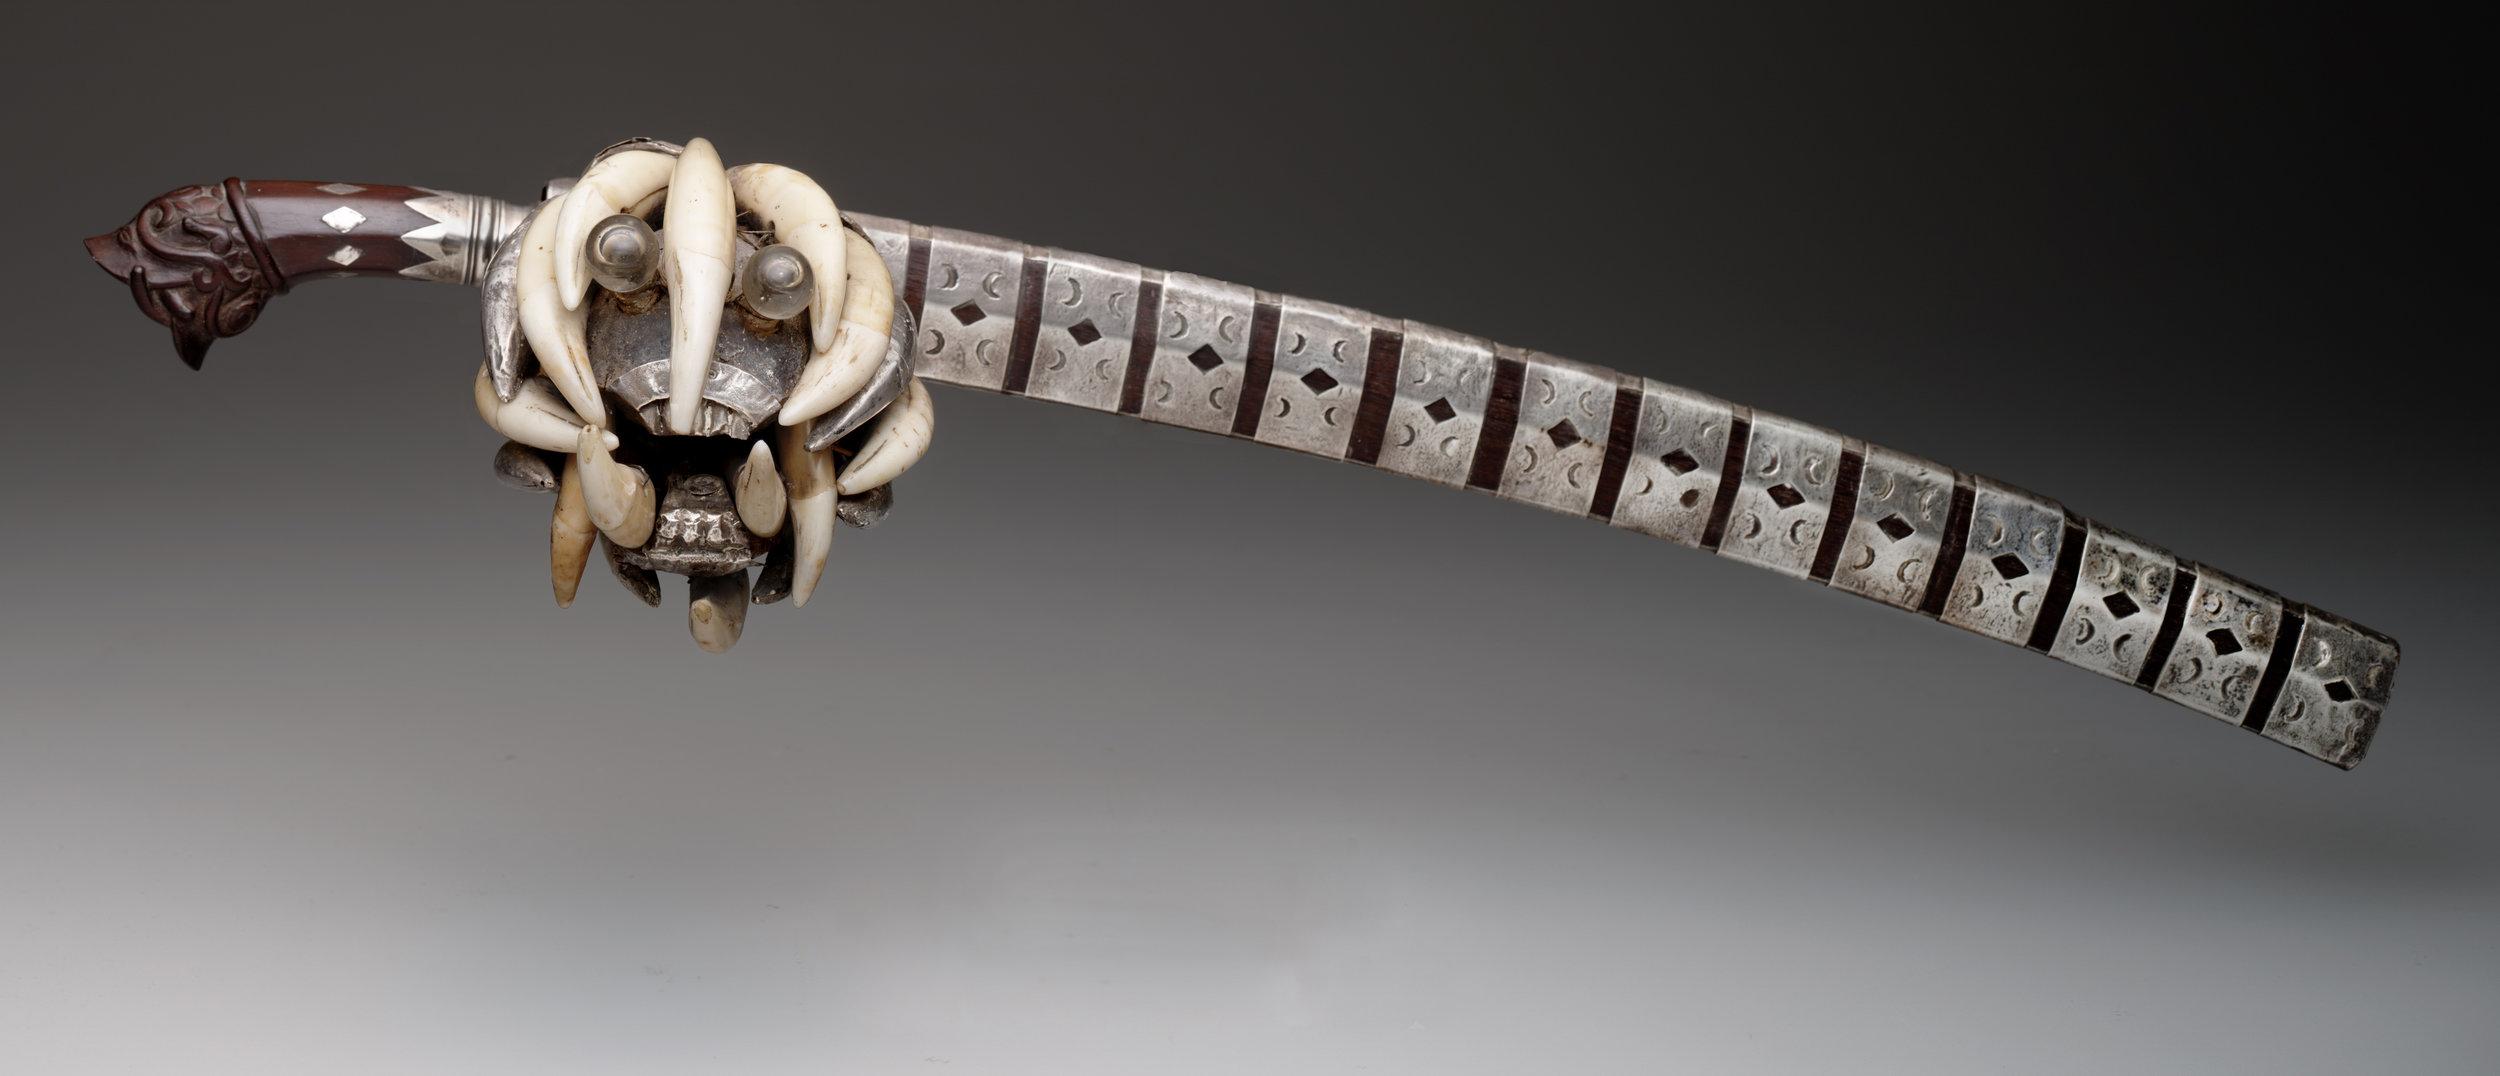 Chief's Sword |  Balatu Sala  © The Dallas Museum of Art | Texas, USA